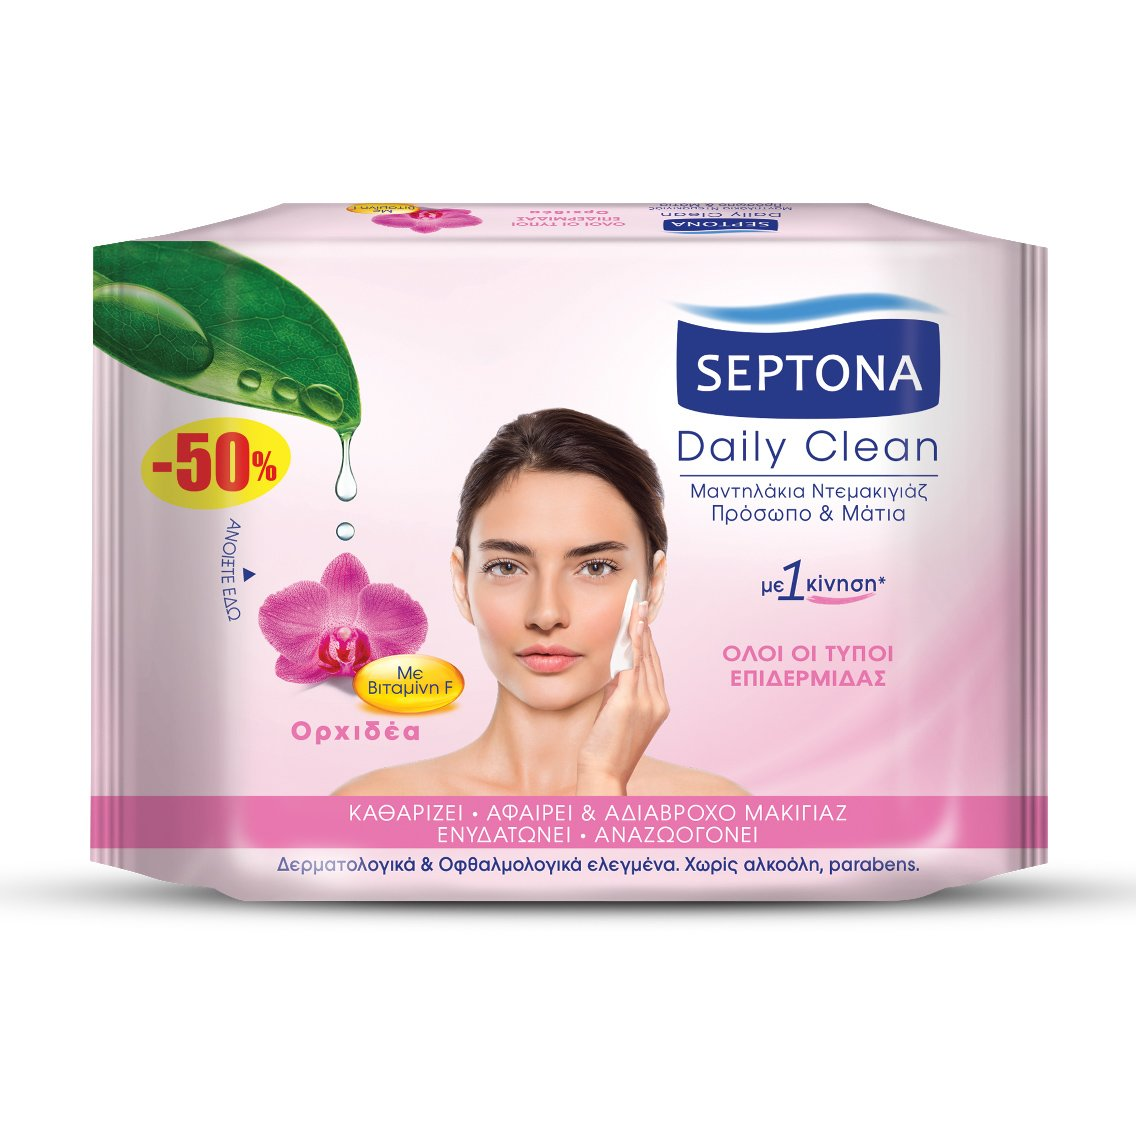 Septona Daily Clean Μαντηλάκια Ντεμακιγιάζ Προσώπου Ματιών με Εκχύλισμα Ορχιδέας & Βιταμίνη F, Όλοι οι Τύποι Επιδερμίδας 20Wipes